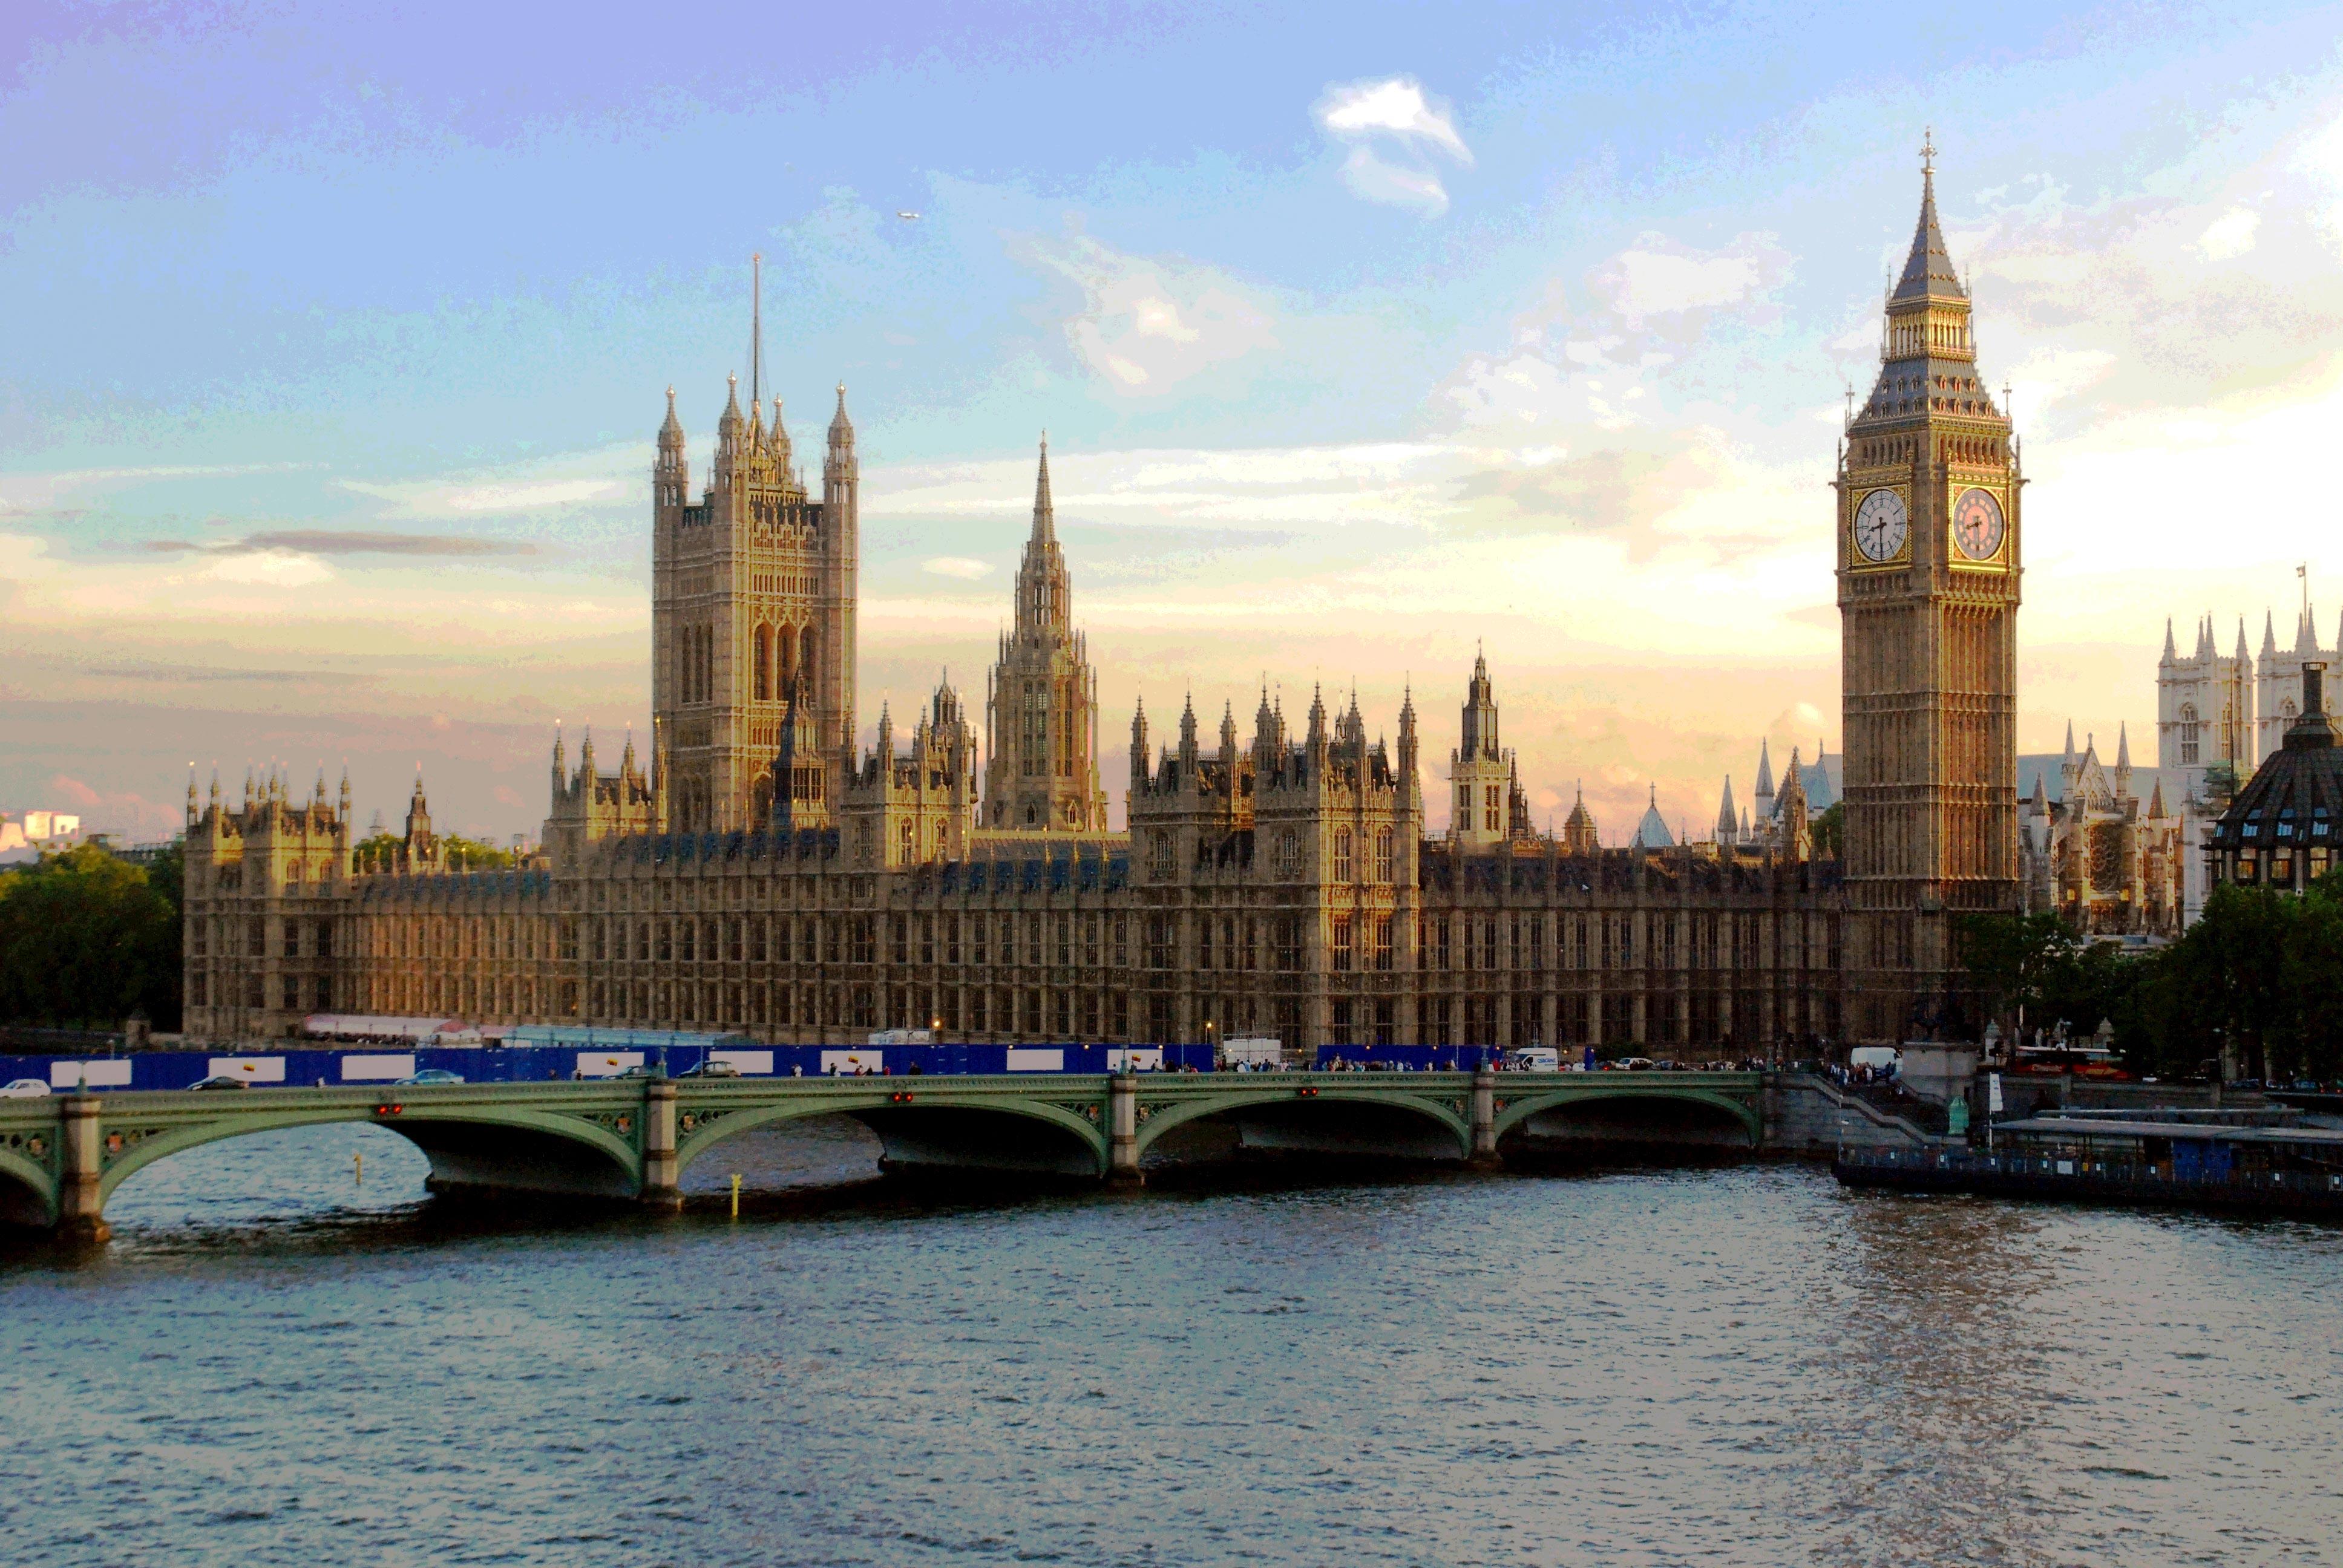 Parliament UK underground